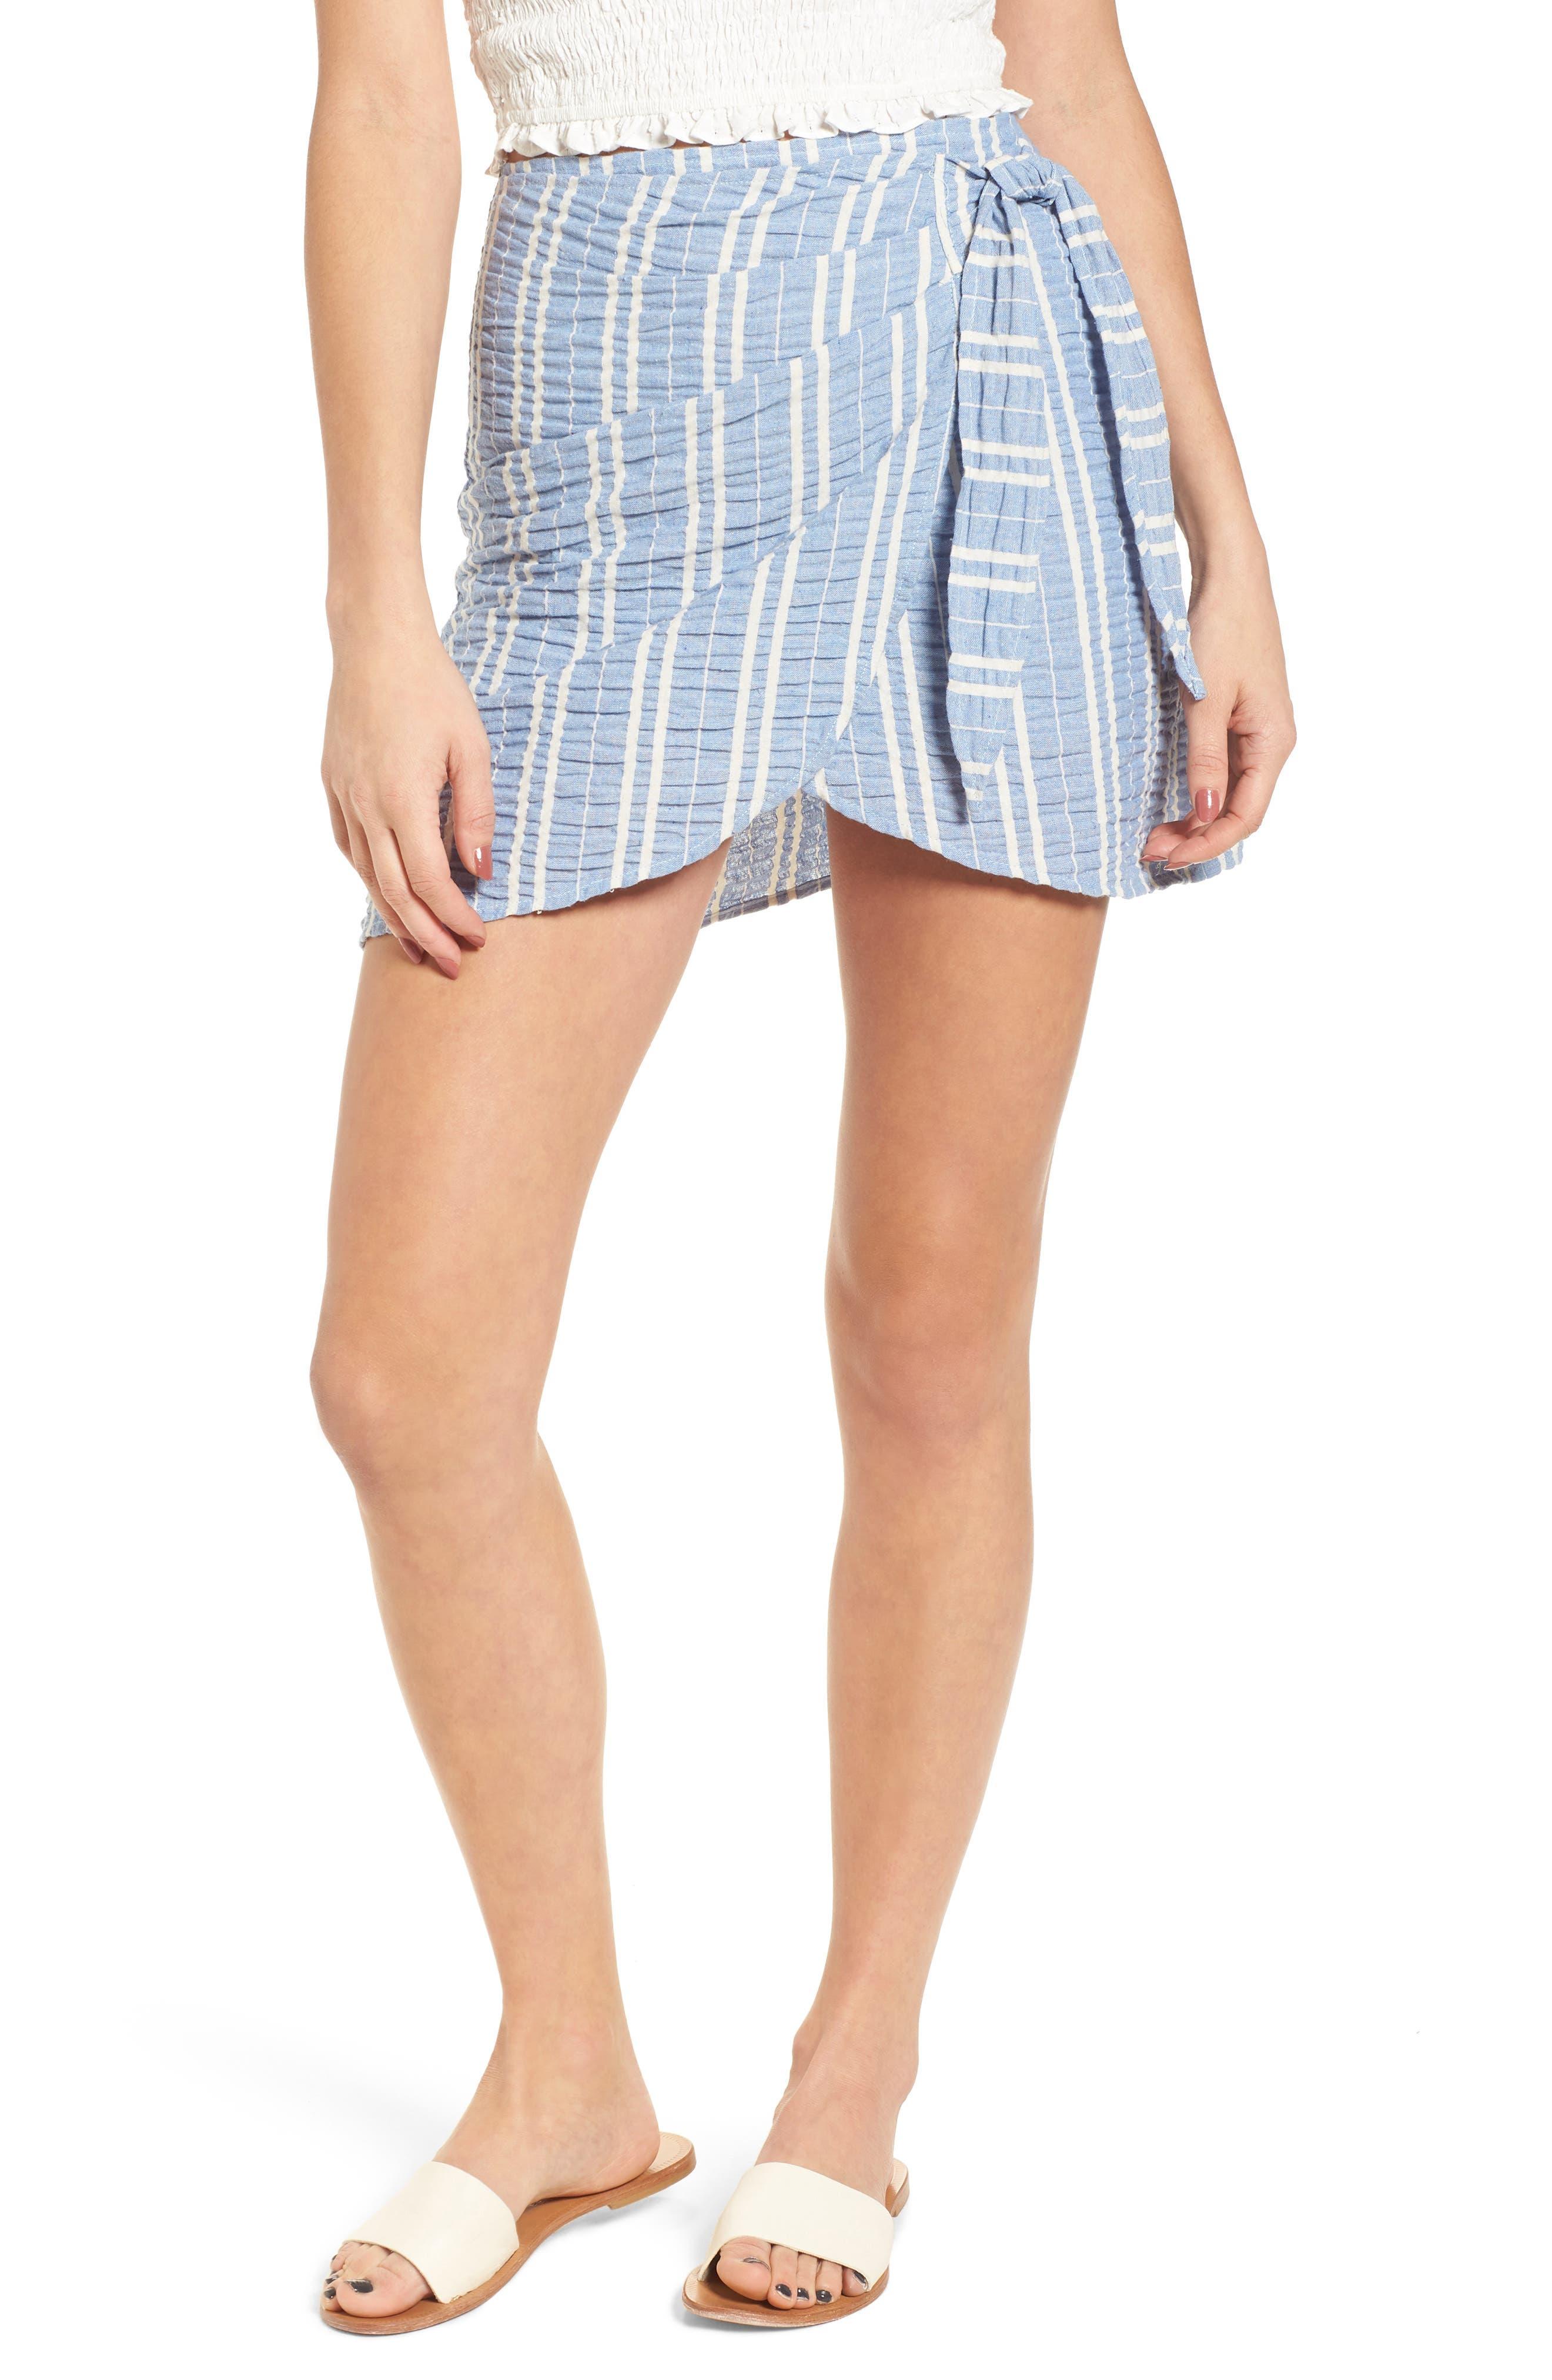 LOST + WANDER,                             Waves Wrap Front Skirt,                             Main thumbnail 1, color,                             466